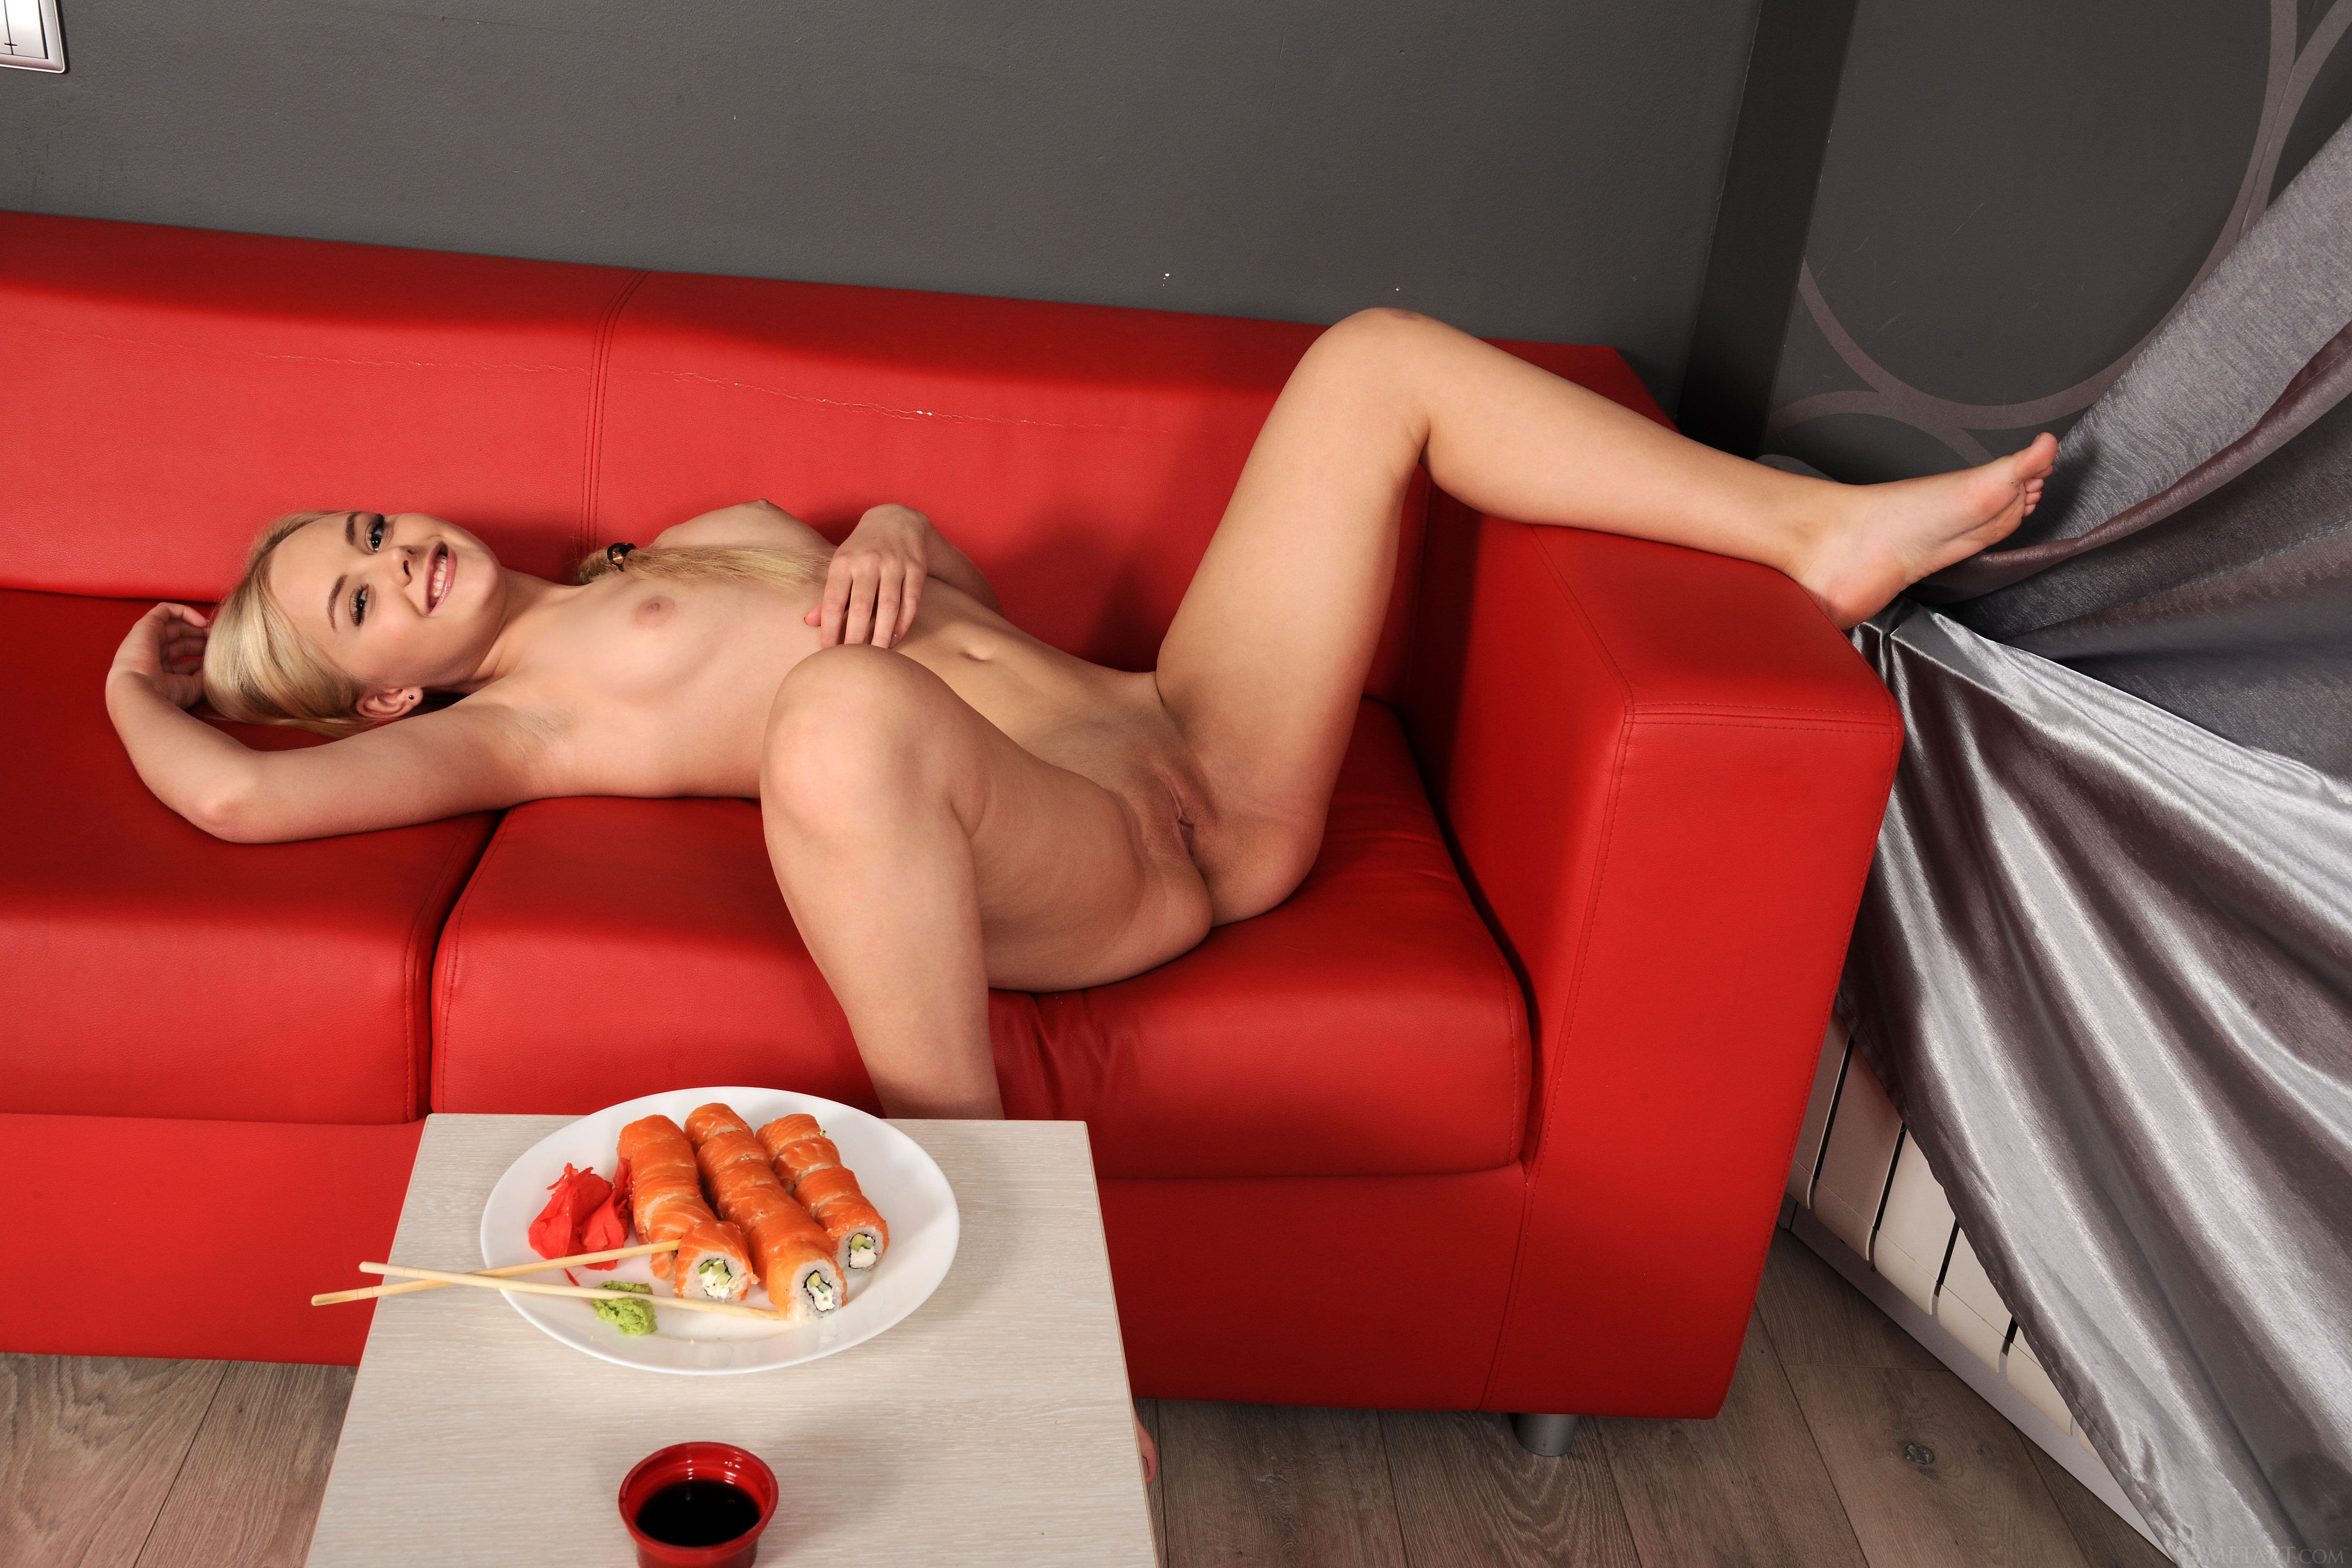 Блондинка разделась за еду на диване - фото